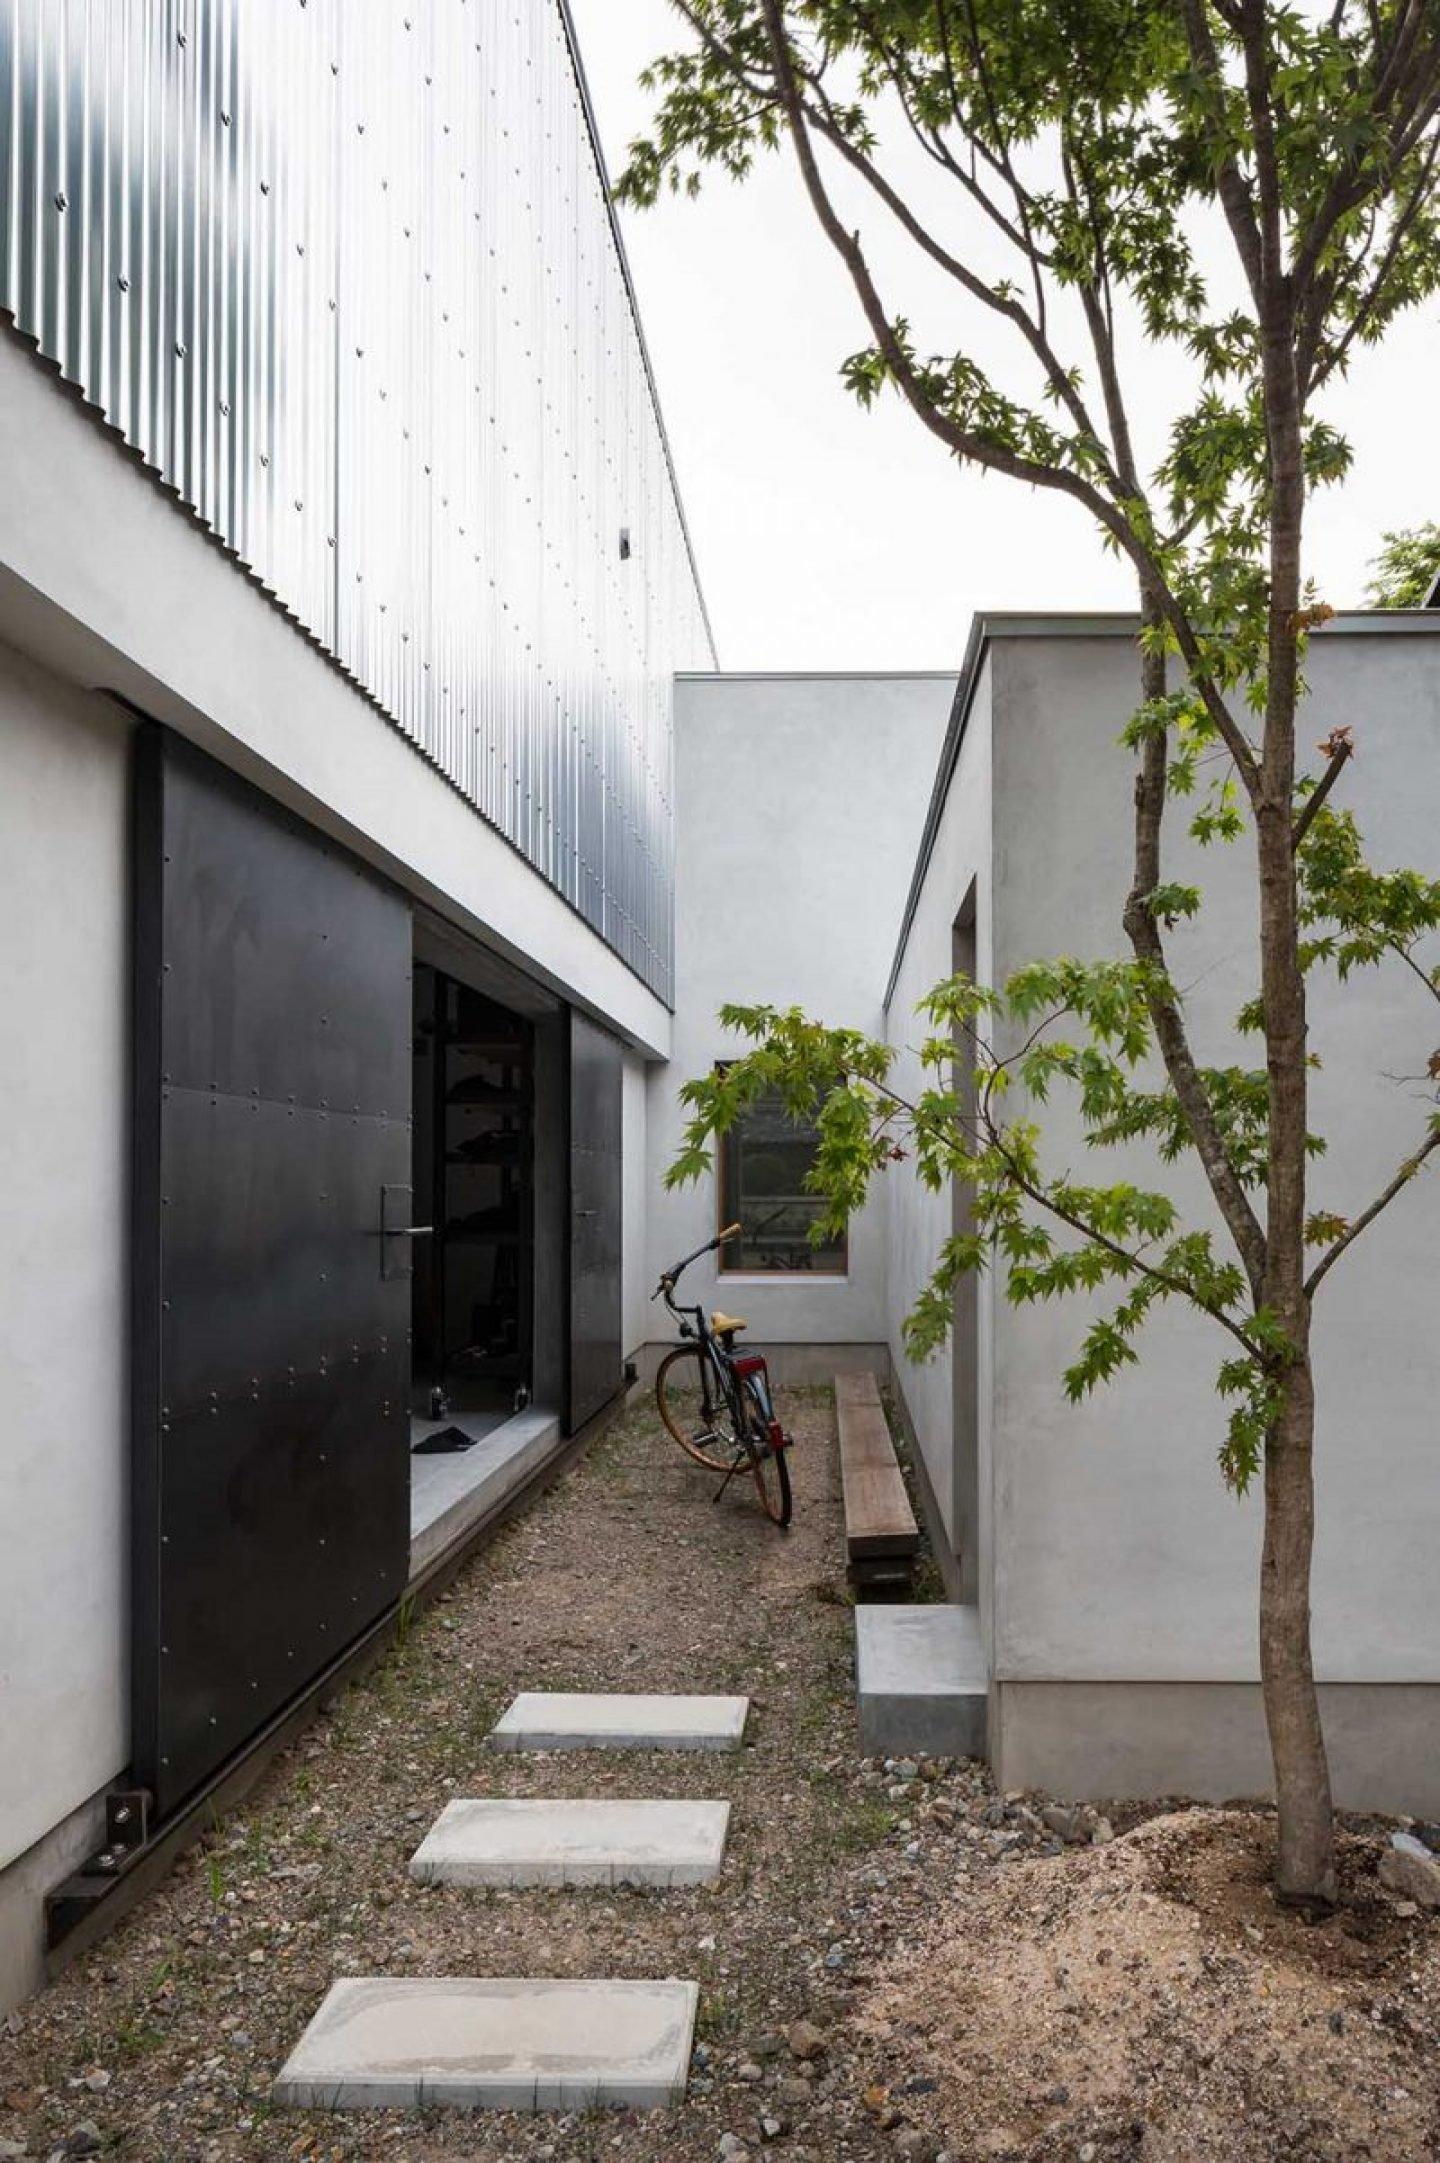 iGNANT_Architecture_House_For_A_Photographer_FORM_Kouichi_Kimura_Architects_5